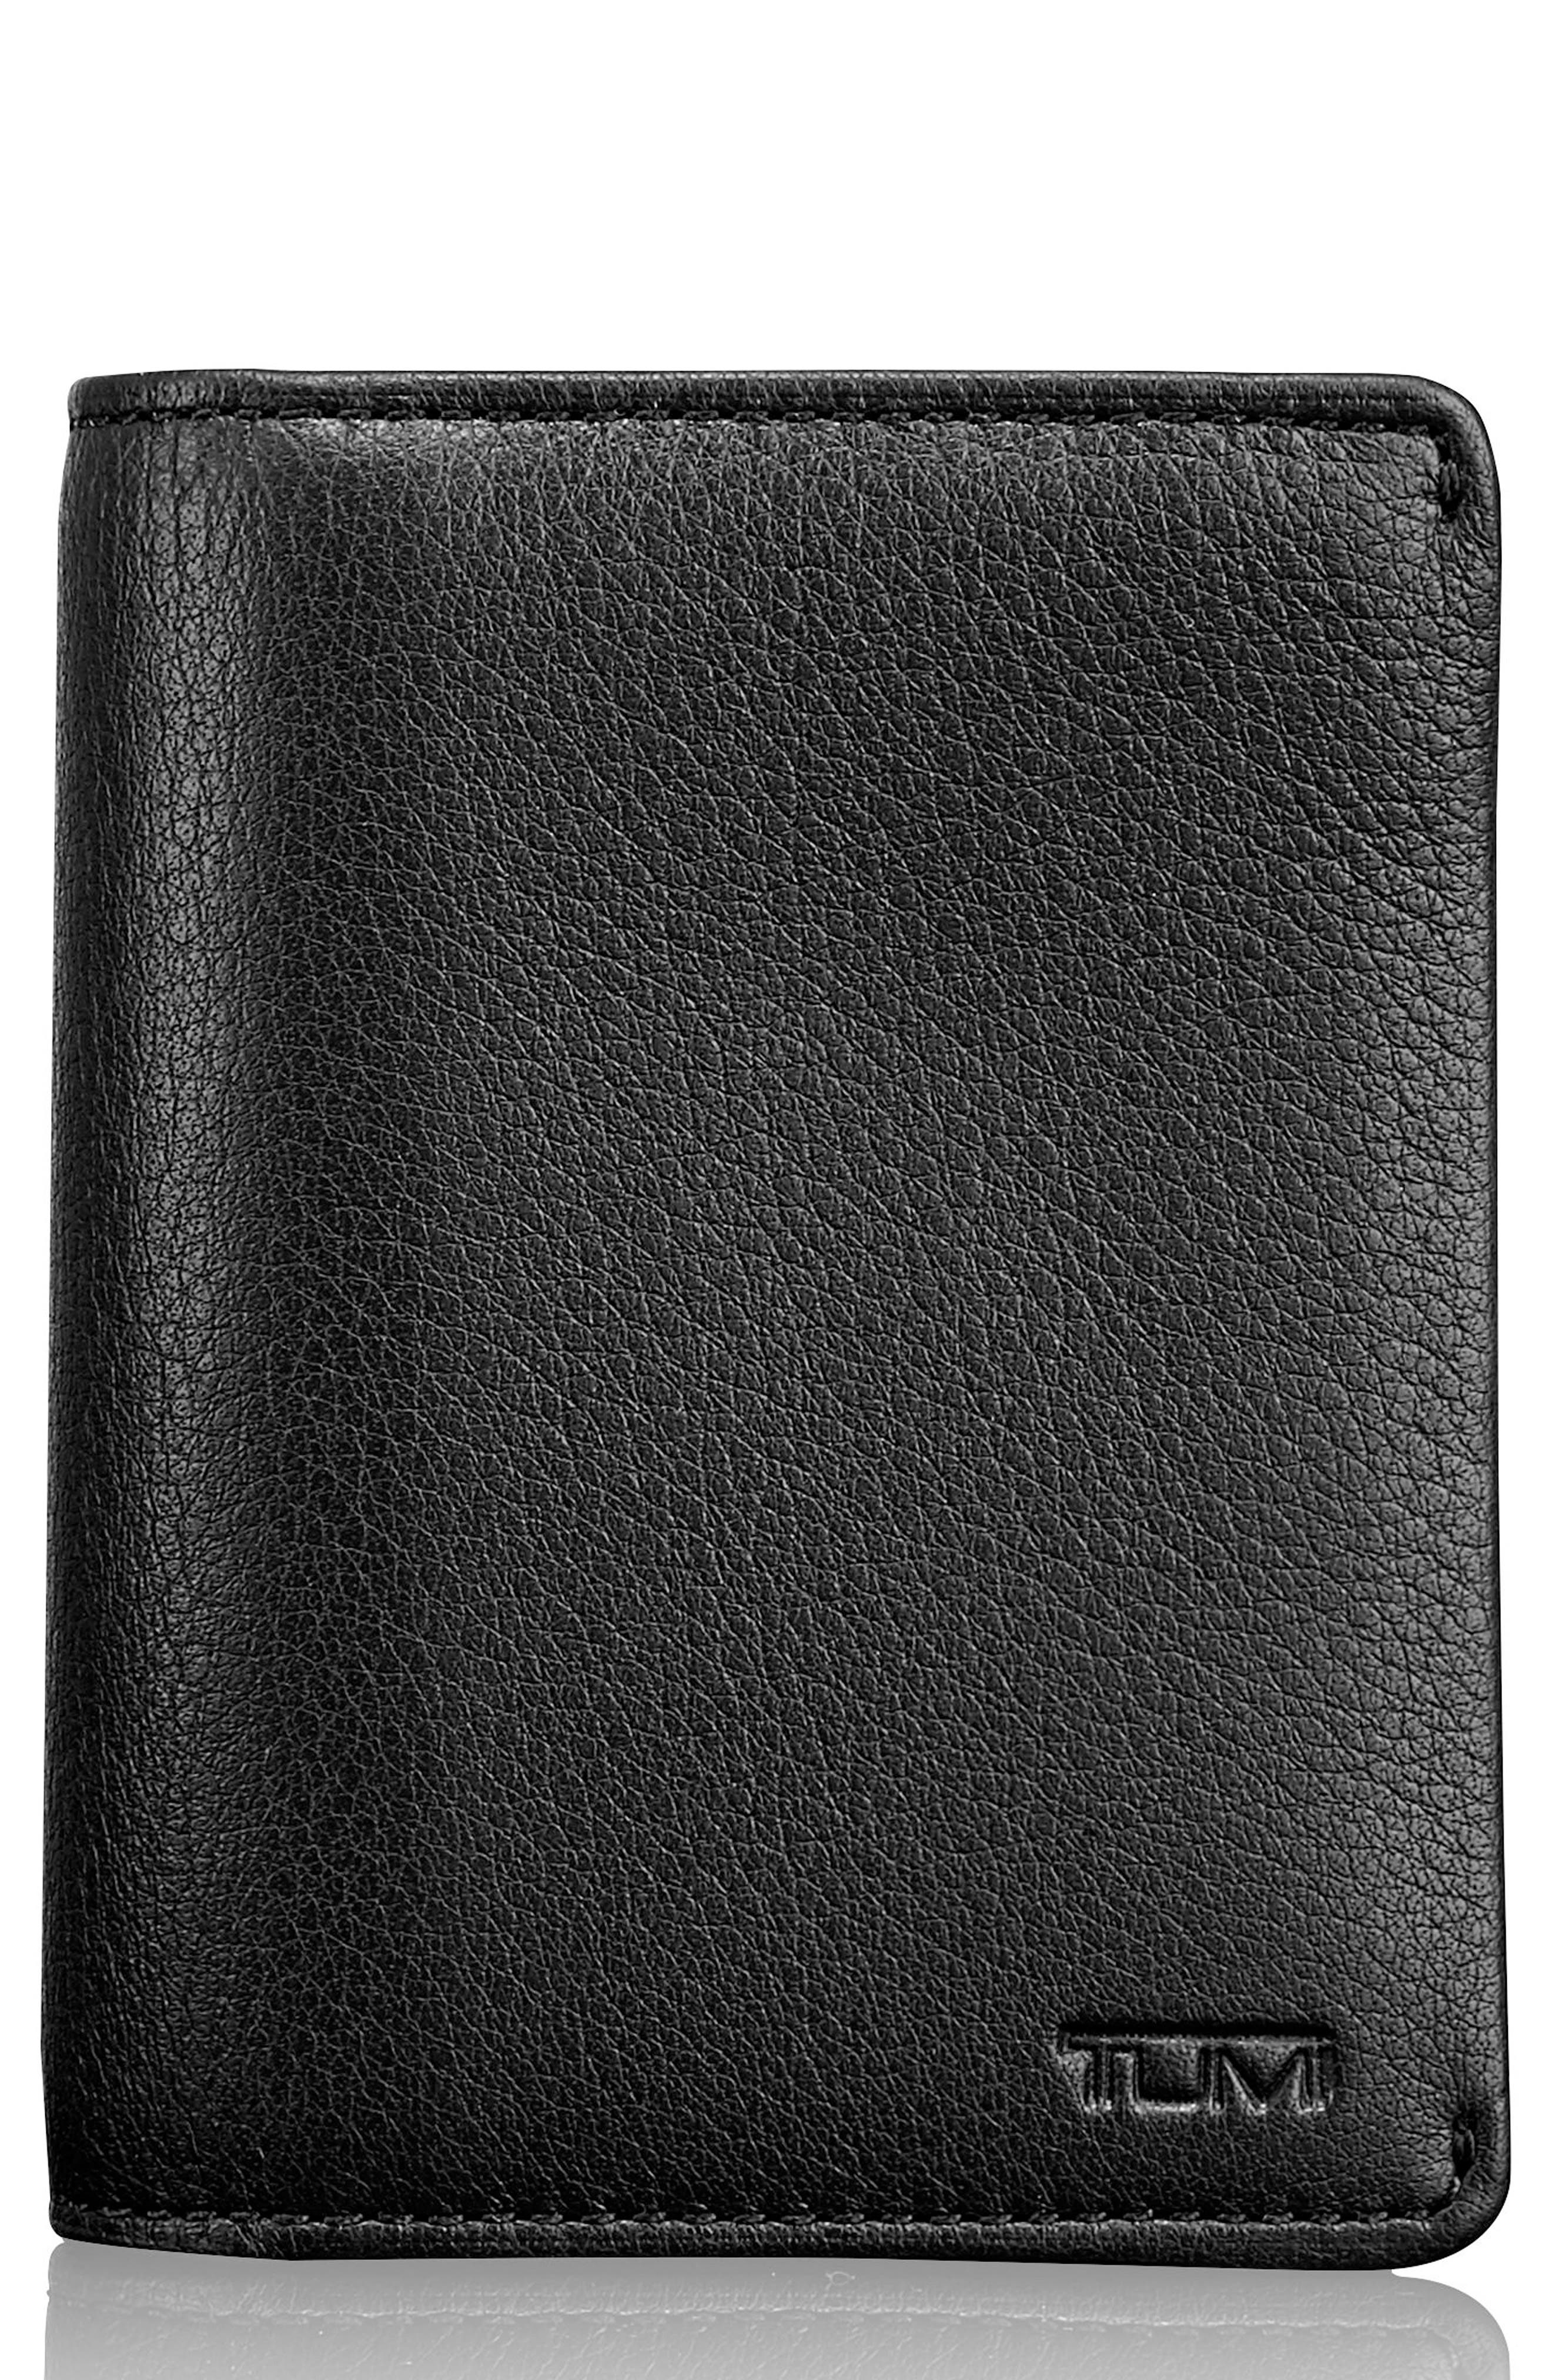 TUMI Leather RFID Card Case, Main, color, BLACK TEXTURED